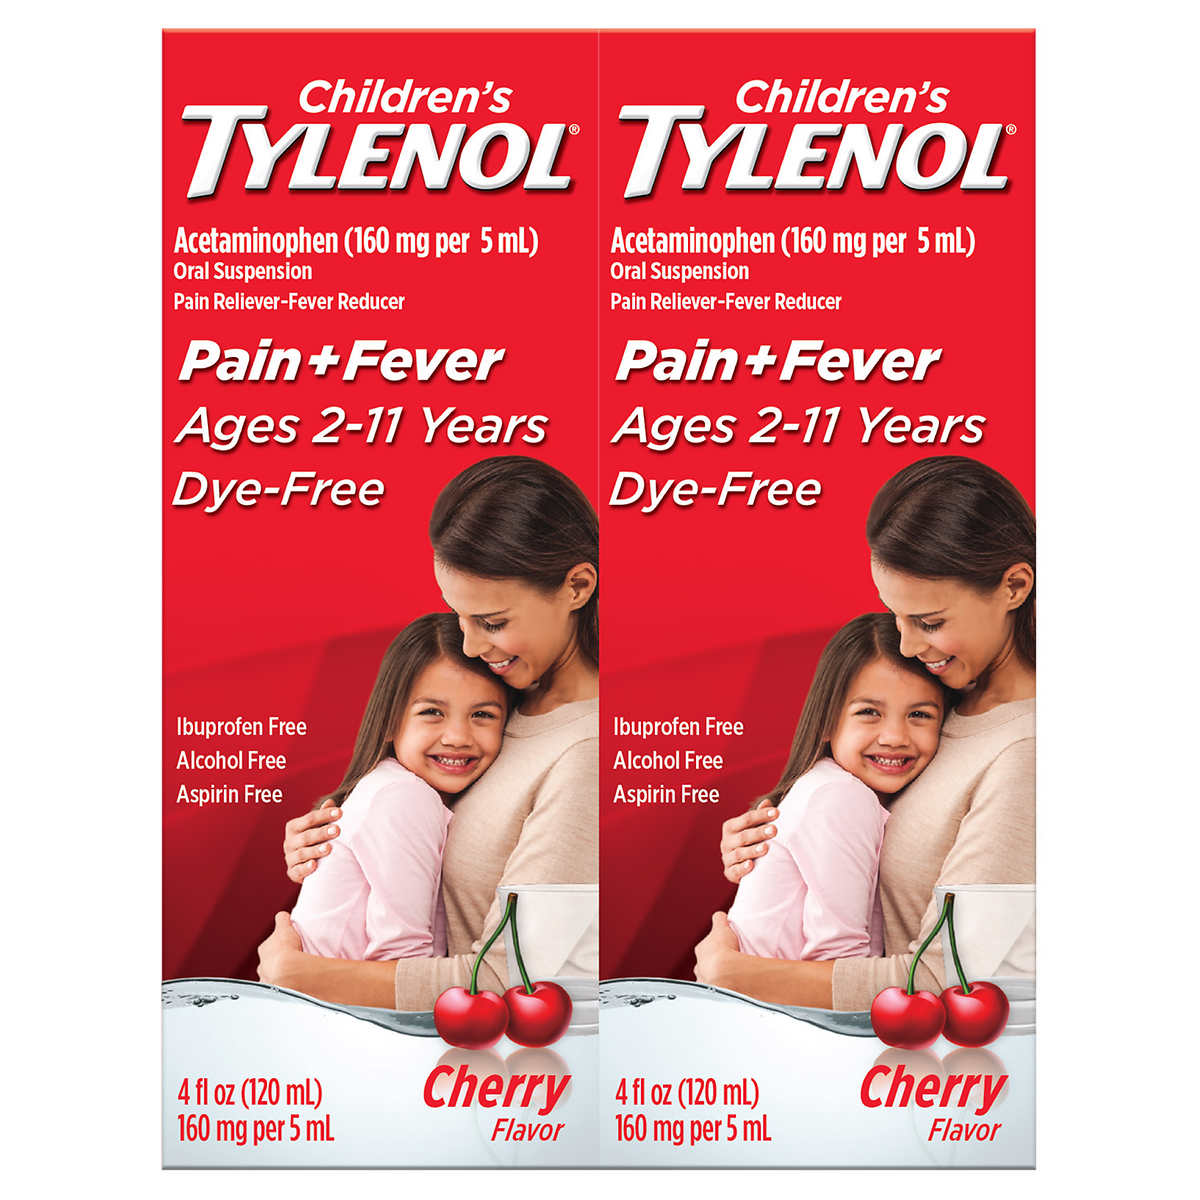 Suspending Little Kids Can Do More Harm >> Children S Tylenol Dye Free Cherry Flavor Suspension 8 Ounces